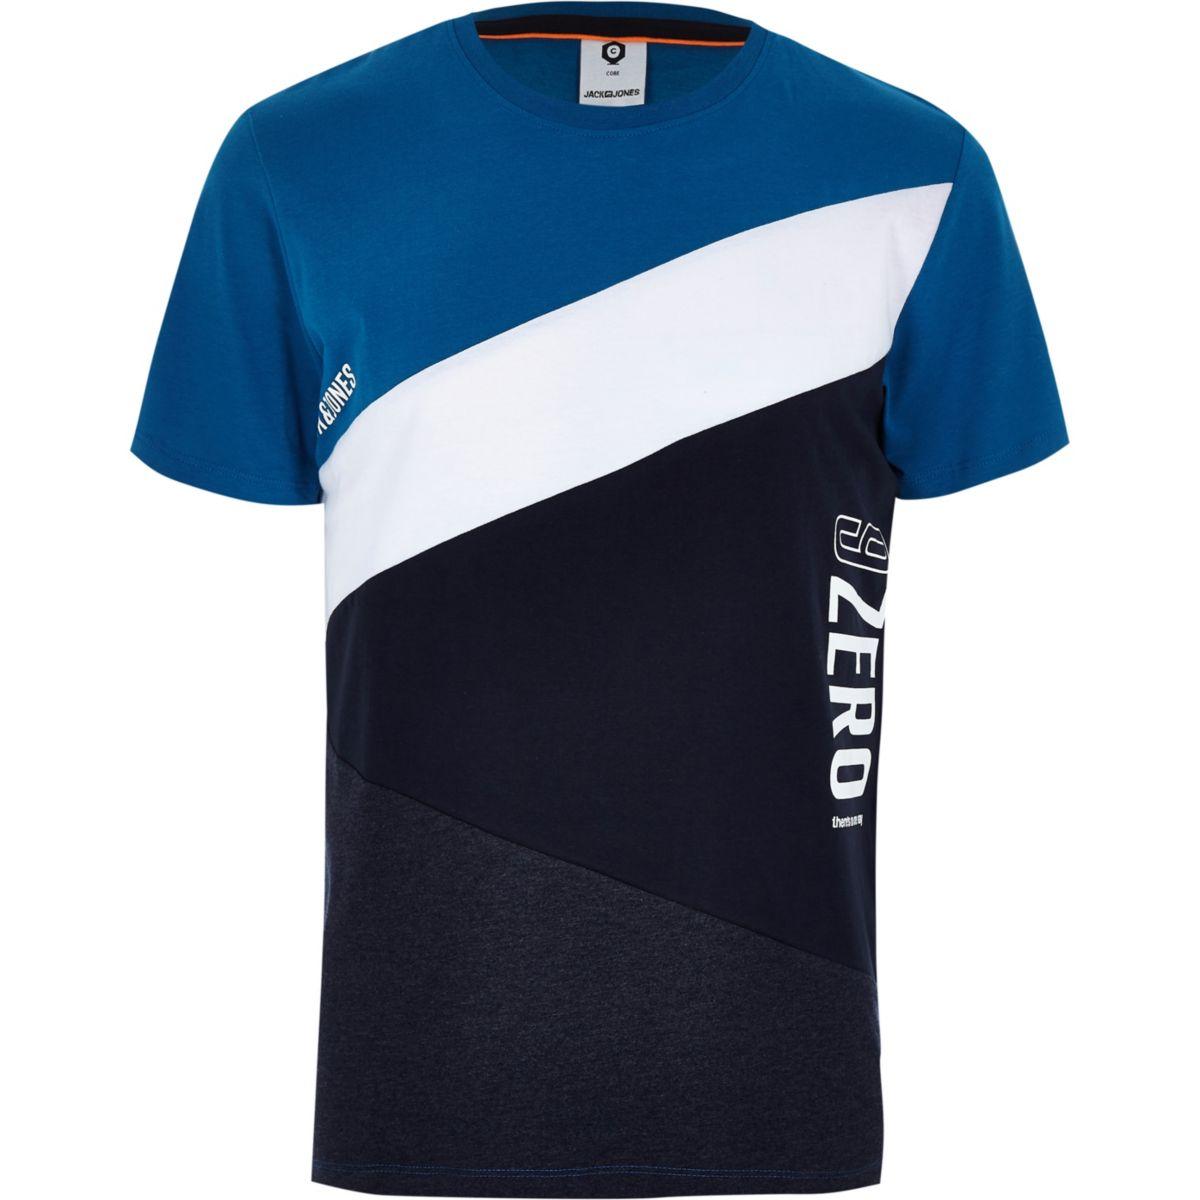 Jack & Jones blue color block T-shirt